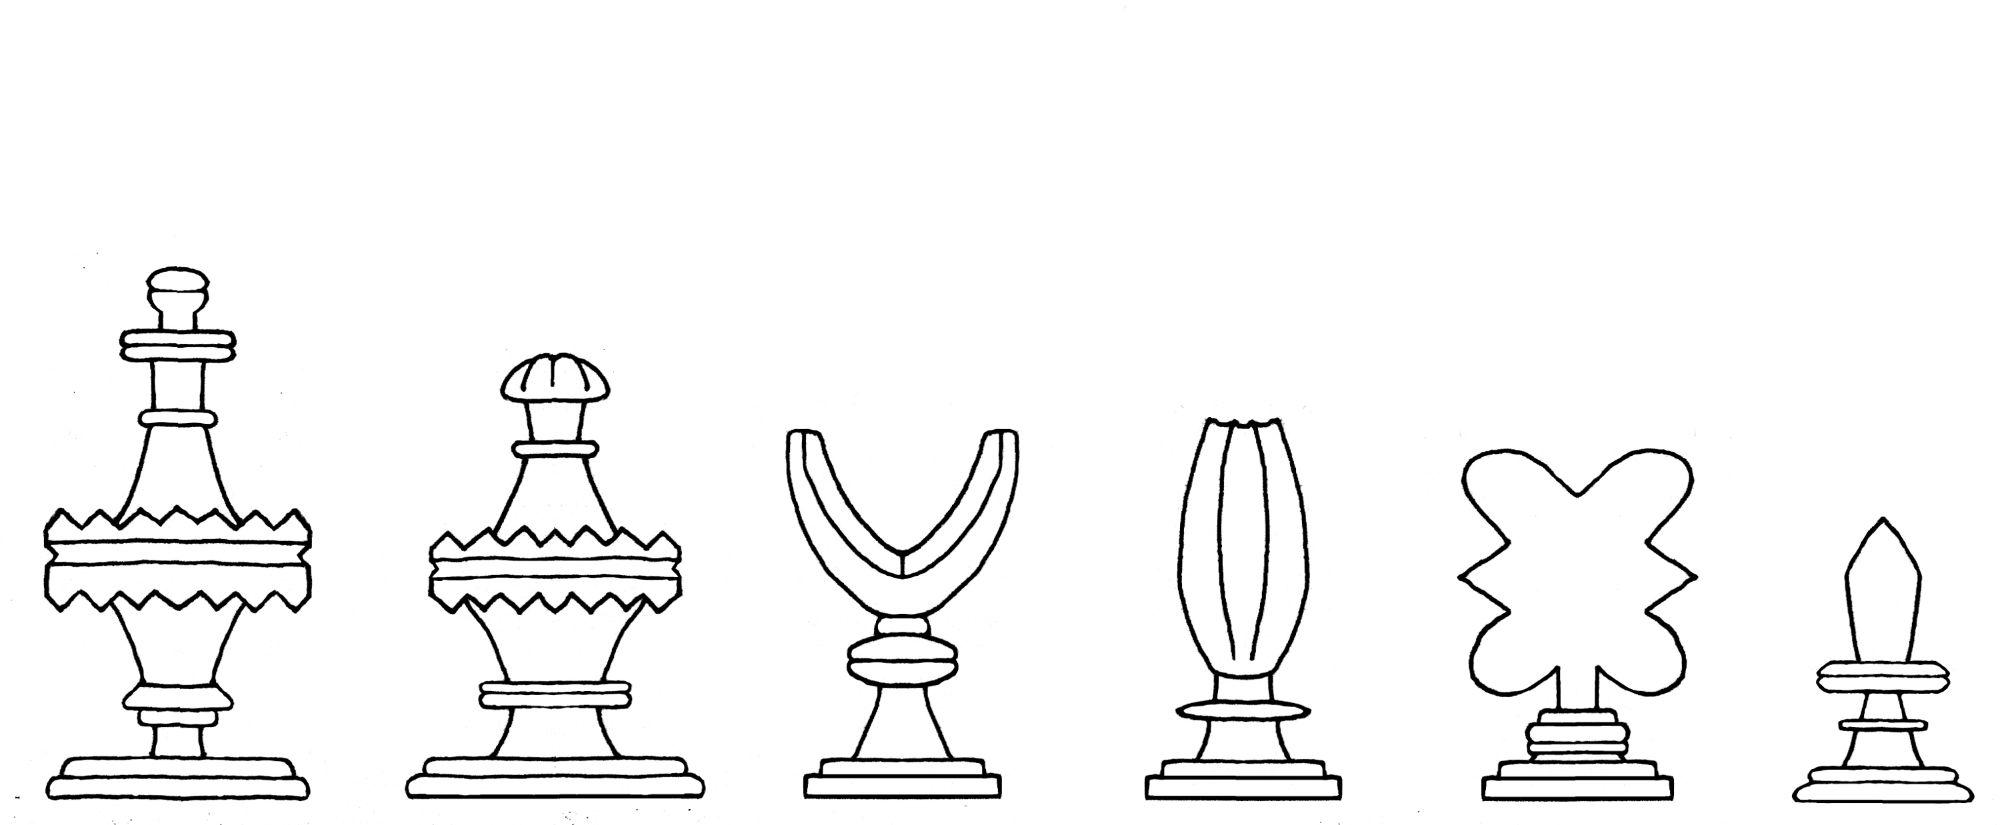 Kobel chess set number 1 interpretive diagram